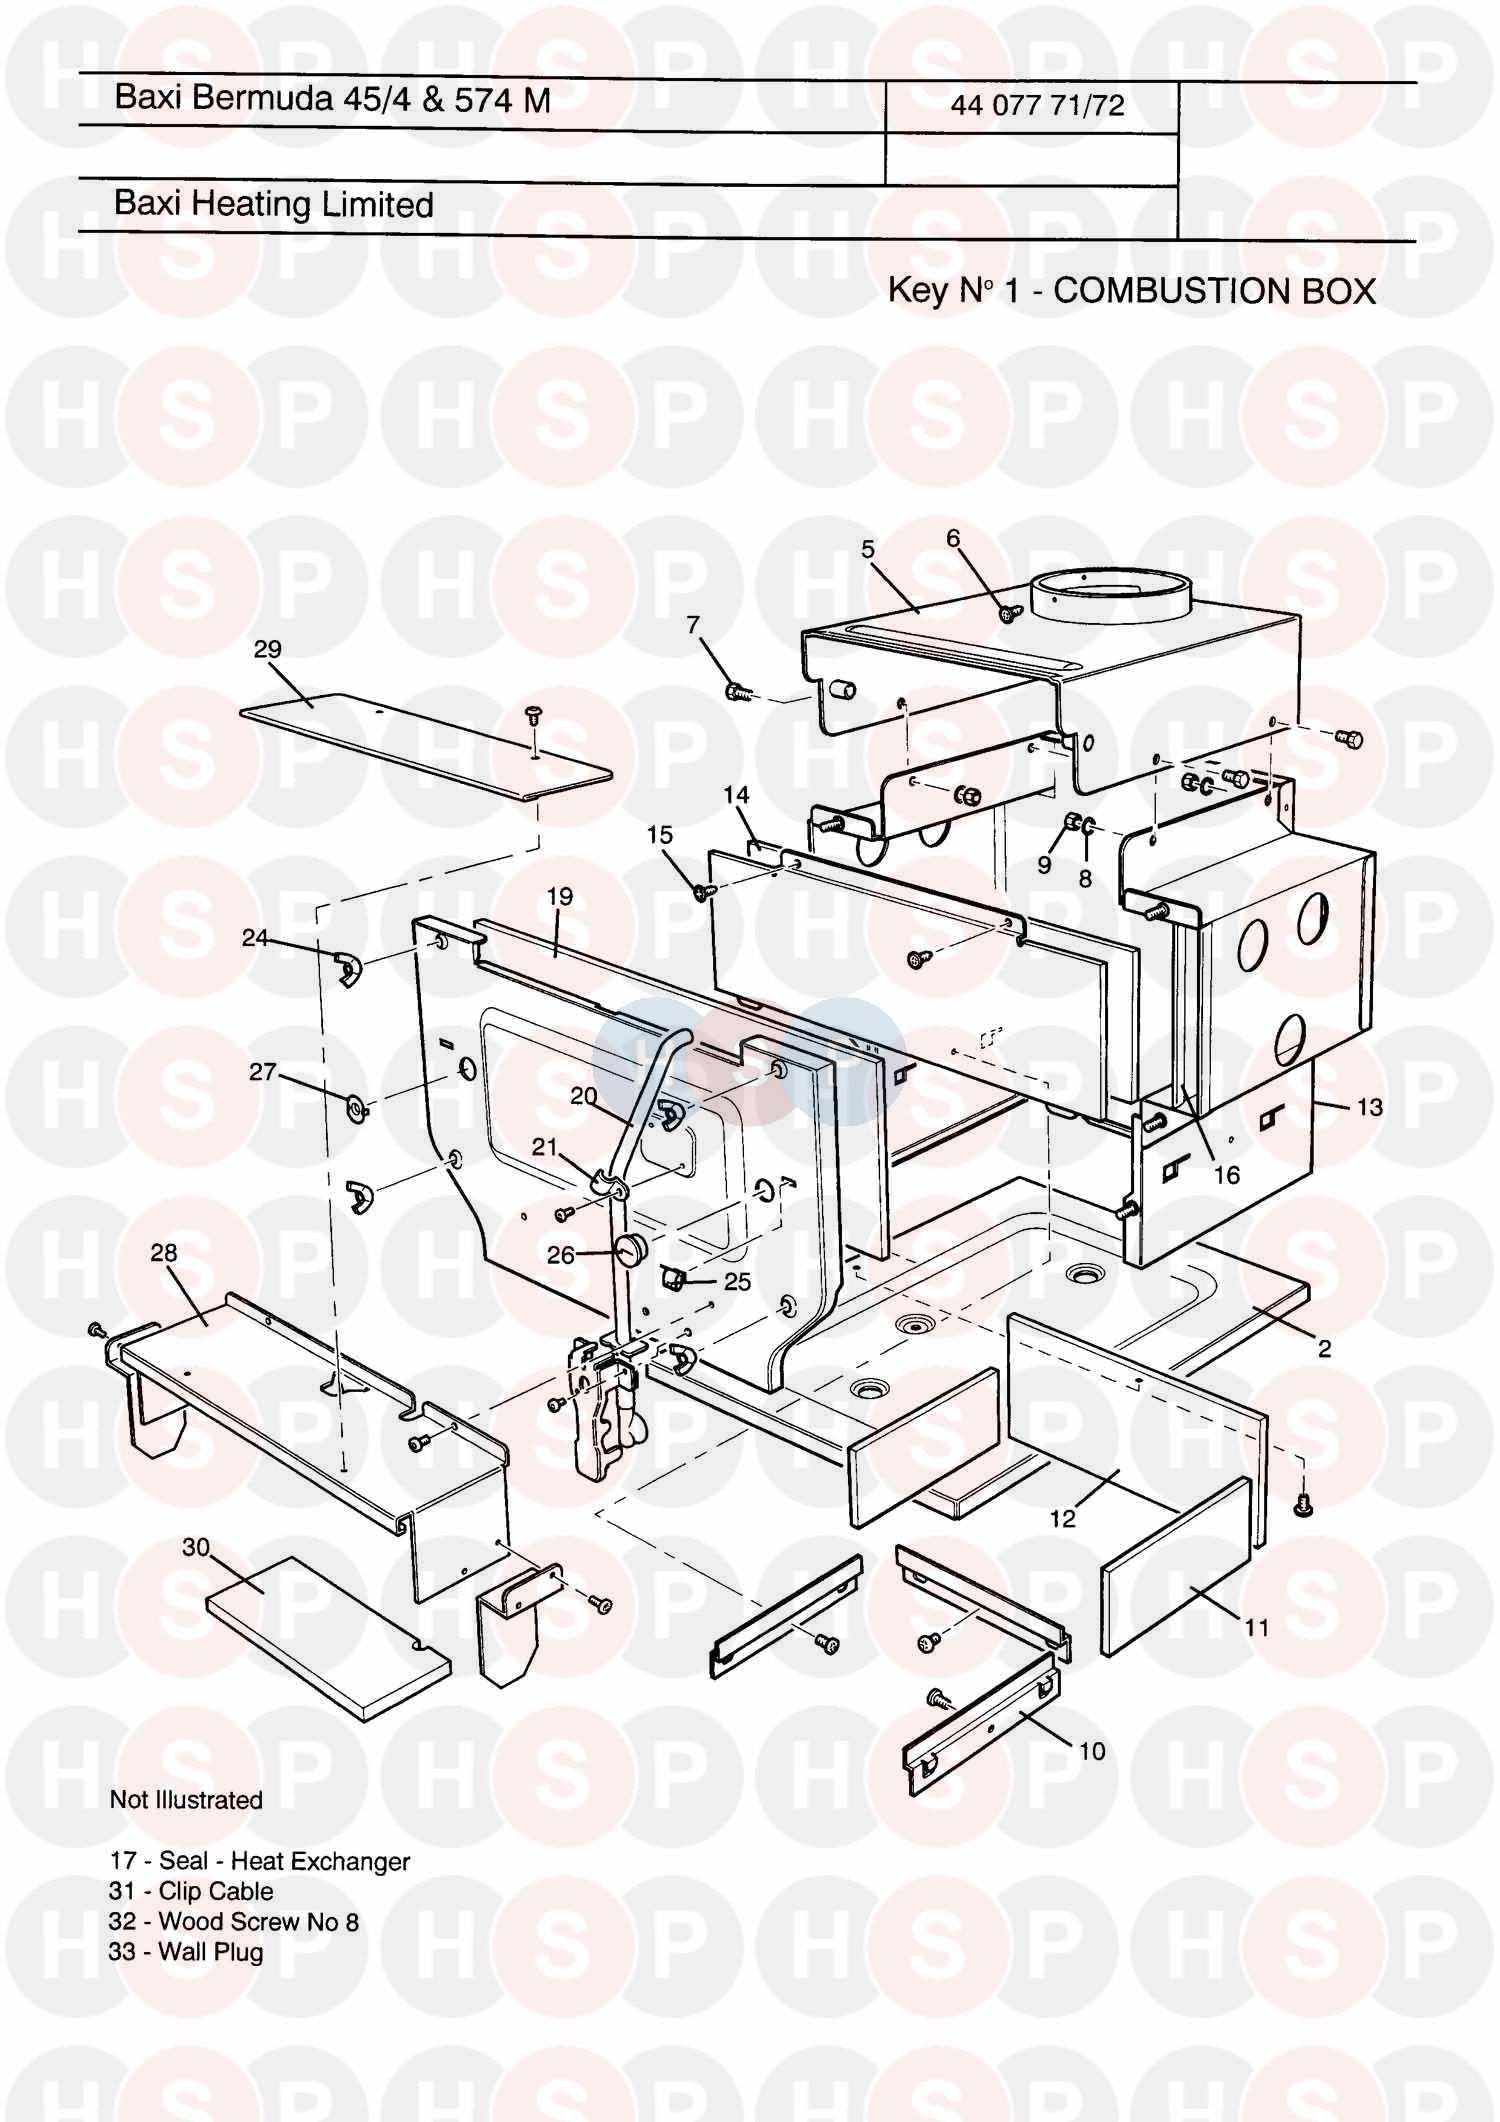 baxi bermuda 57  4 manual  combustion box  diagram